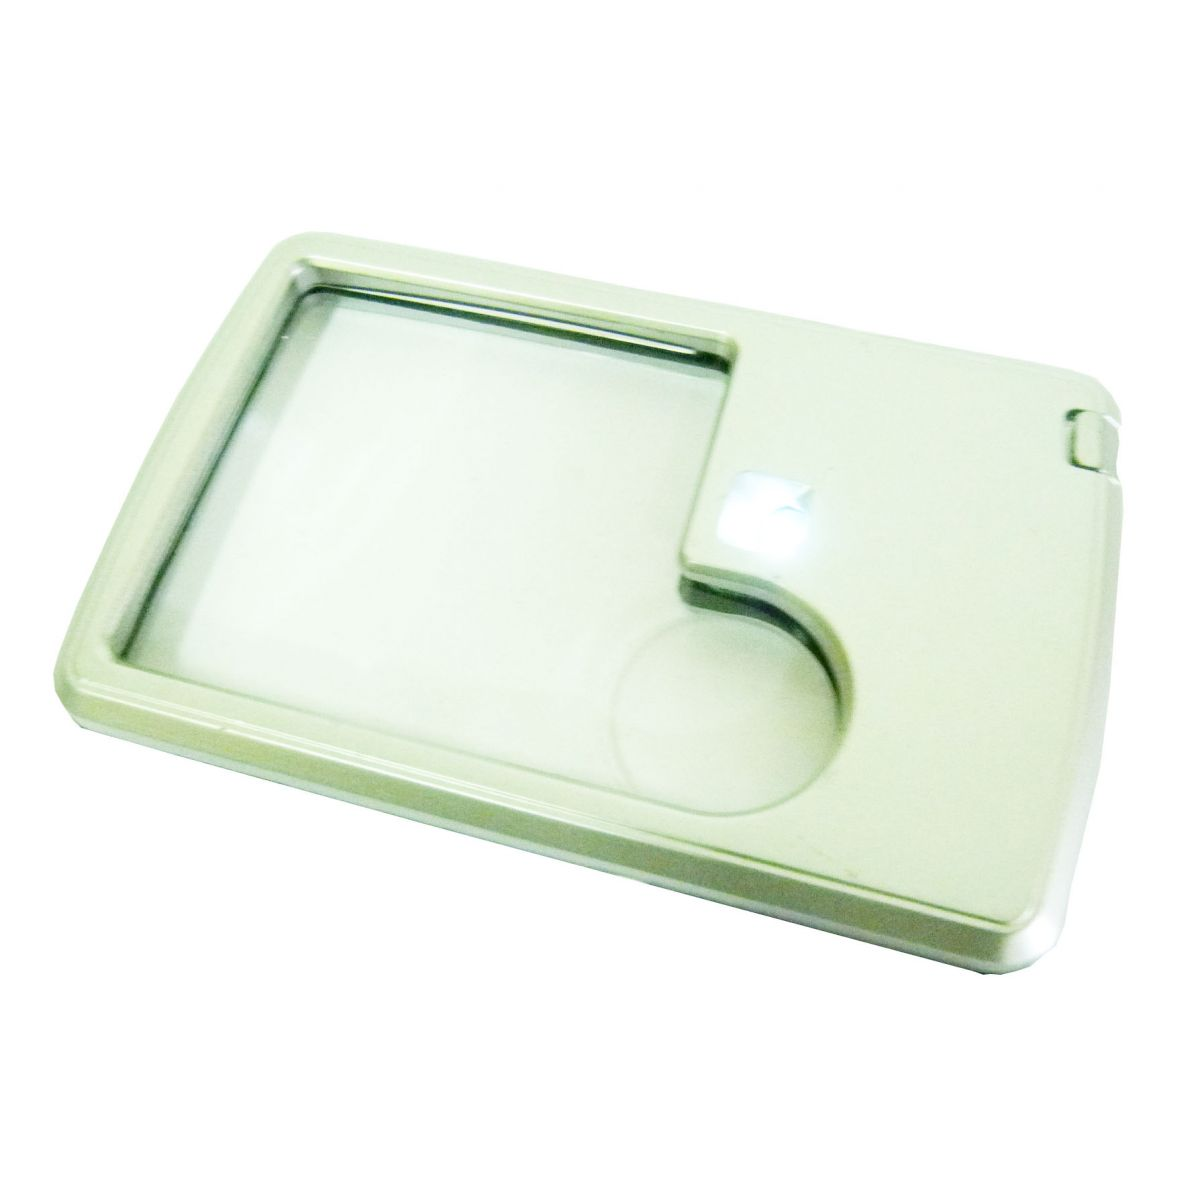 Lupa Formato Cartão Iluminada 3x